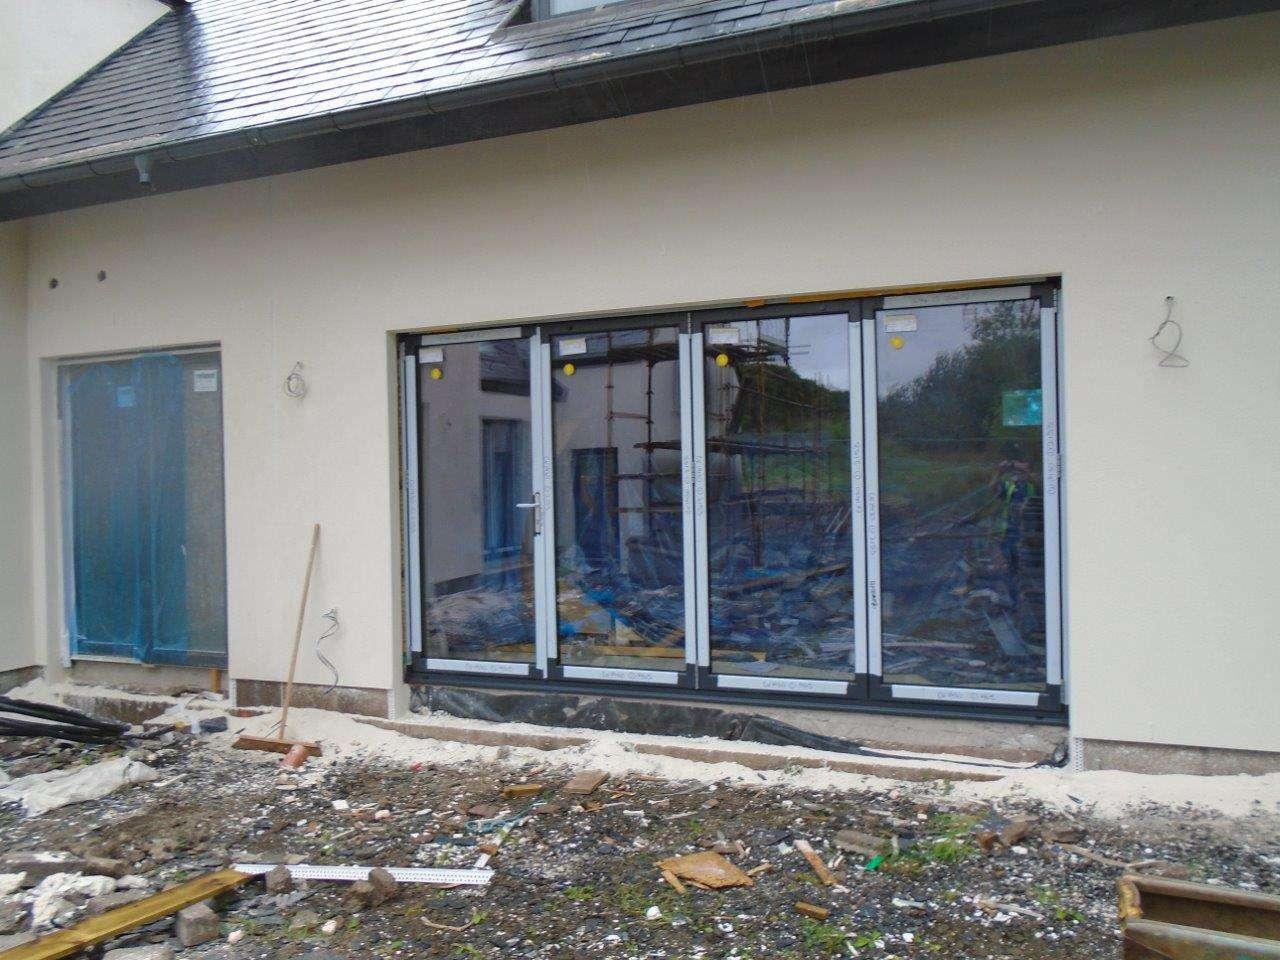 4 Pane Door Installed in New Build & Case Studies | Customers | Aluminium | Windows | Doors | Bi-folding ...